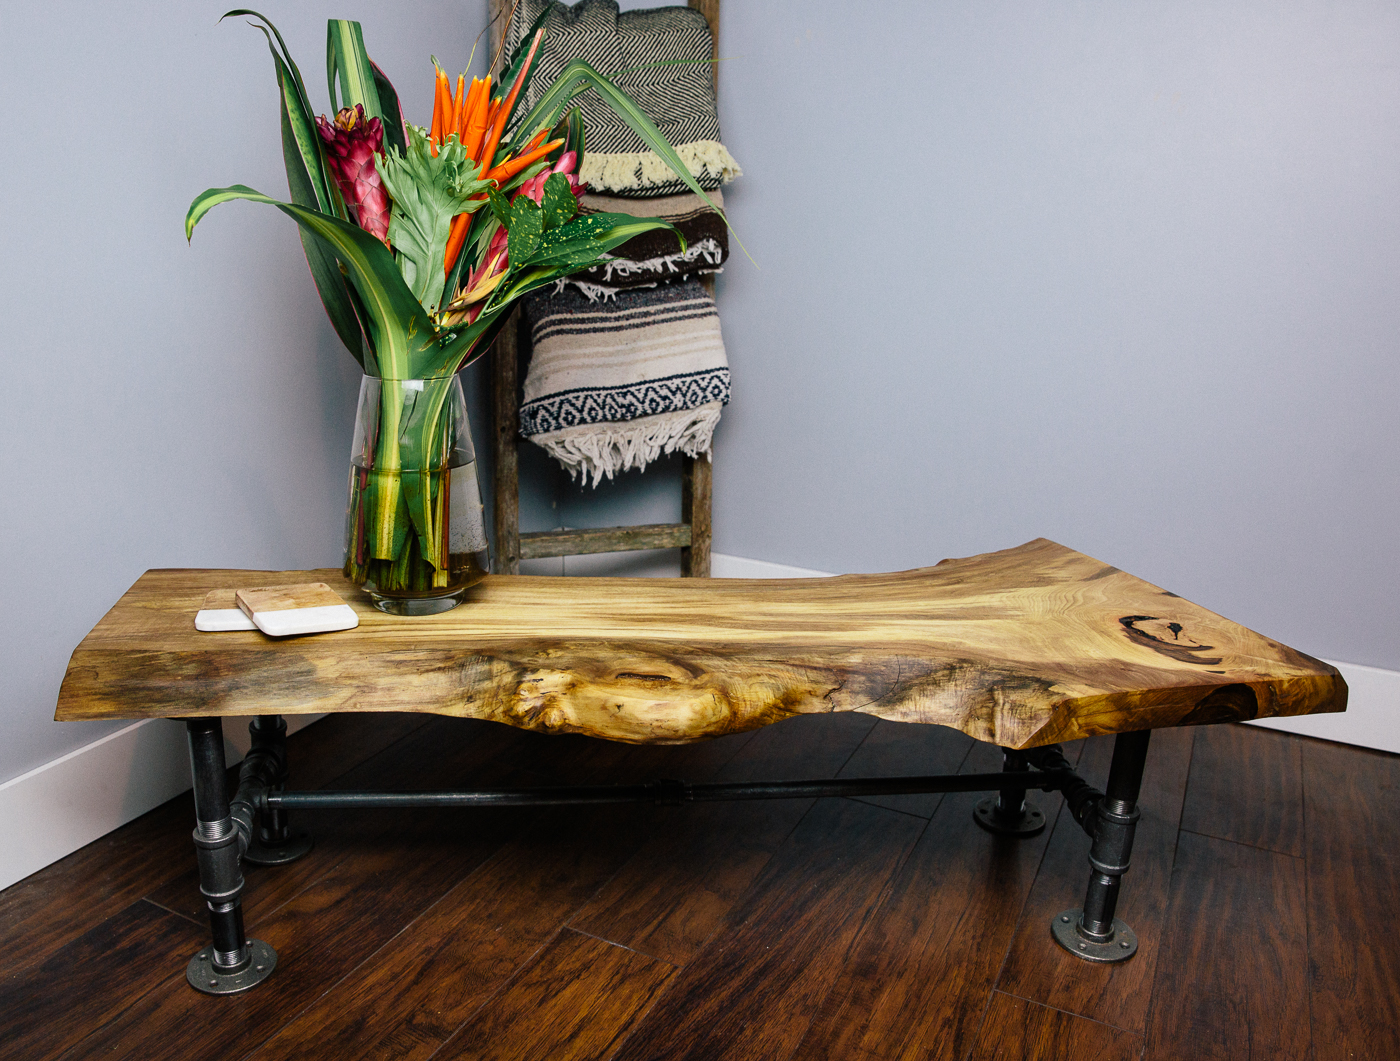 live-edge wood coffee table.JPG